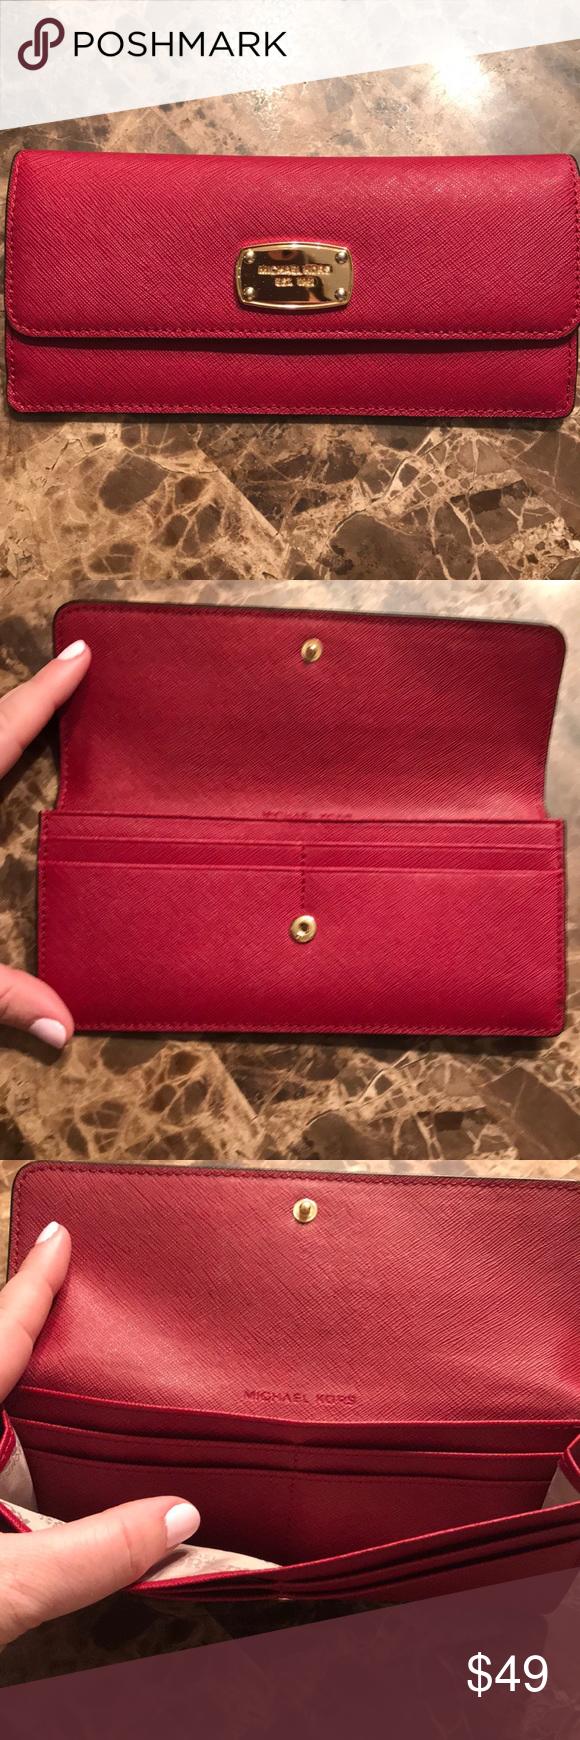 MK red wallet